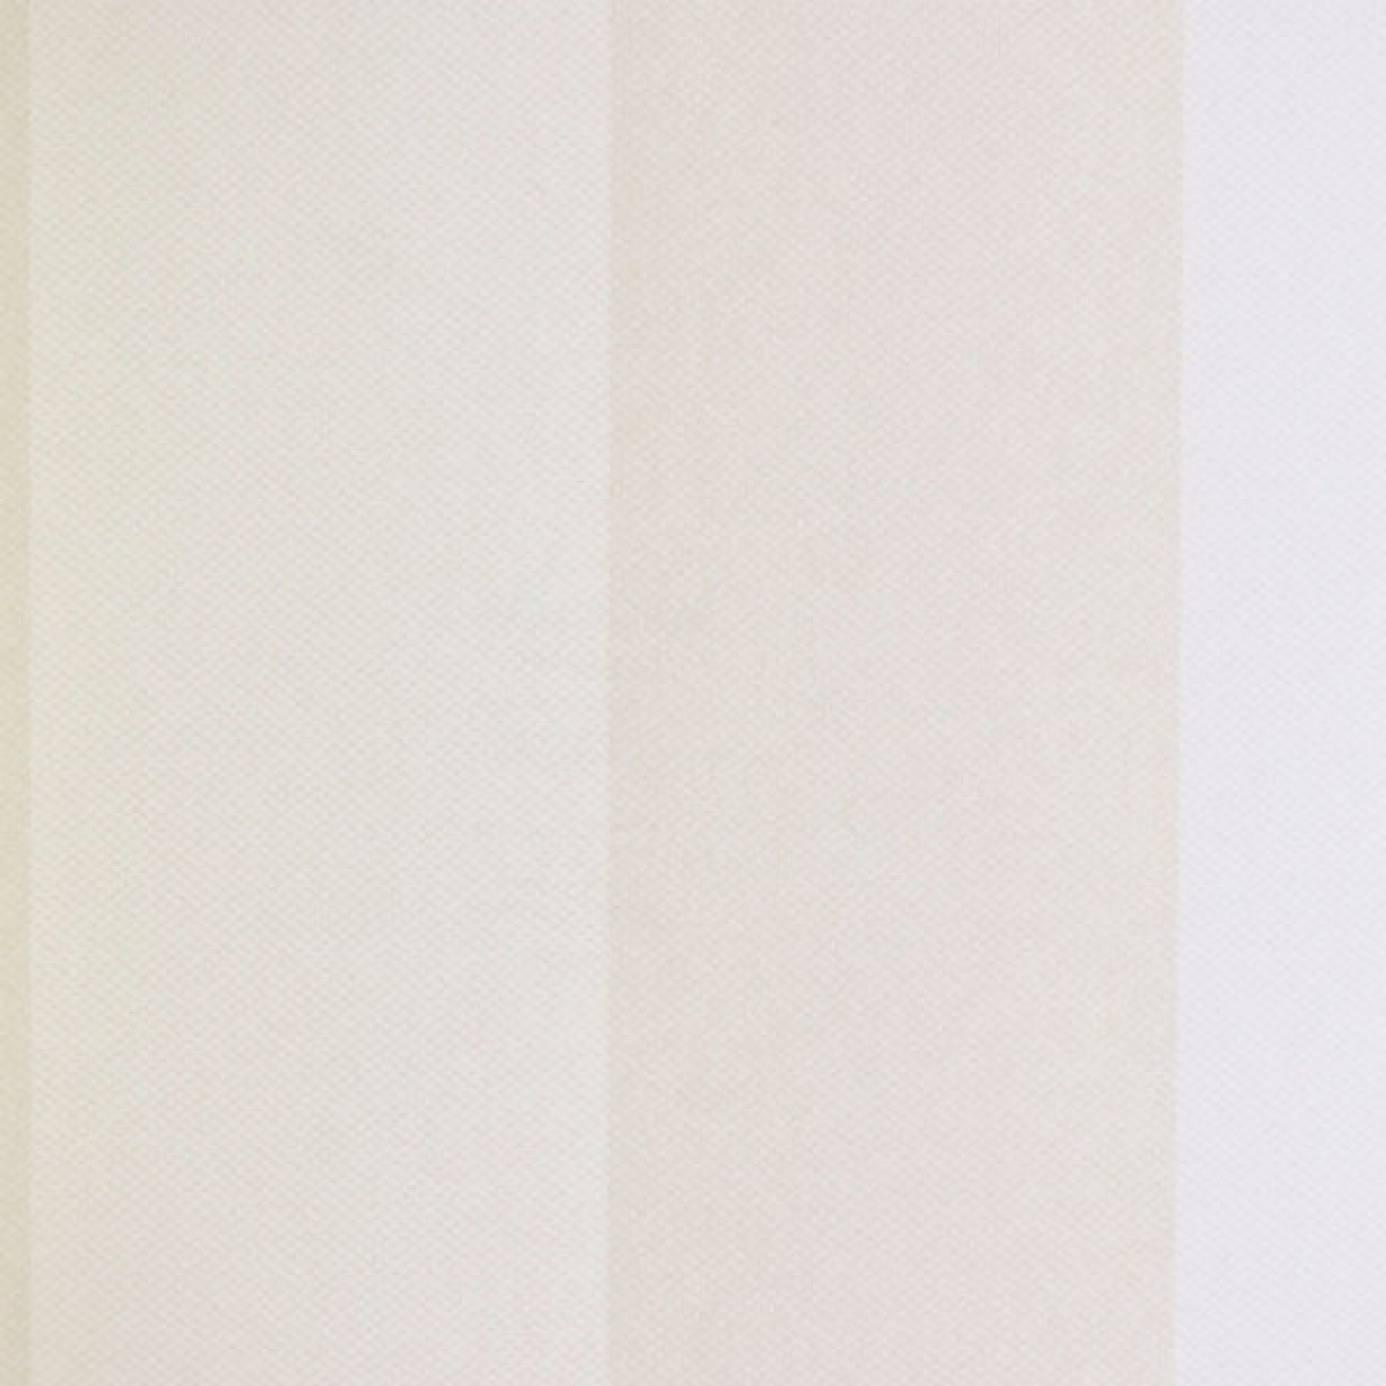 Французские обои Casadeco,  коллекция So White 2, артикулSWI21691130